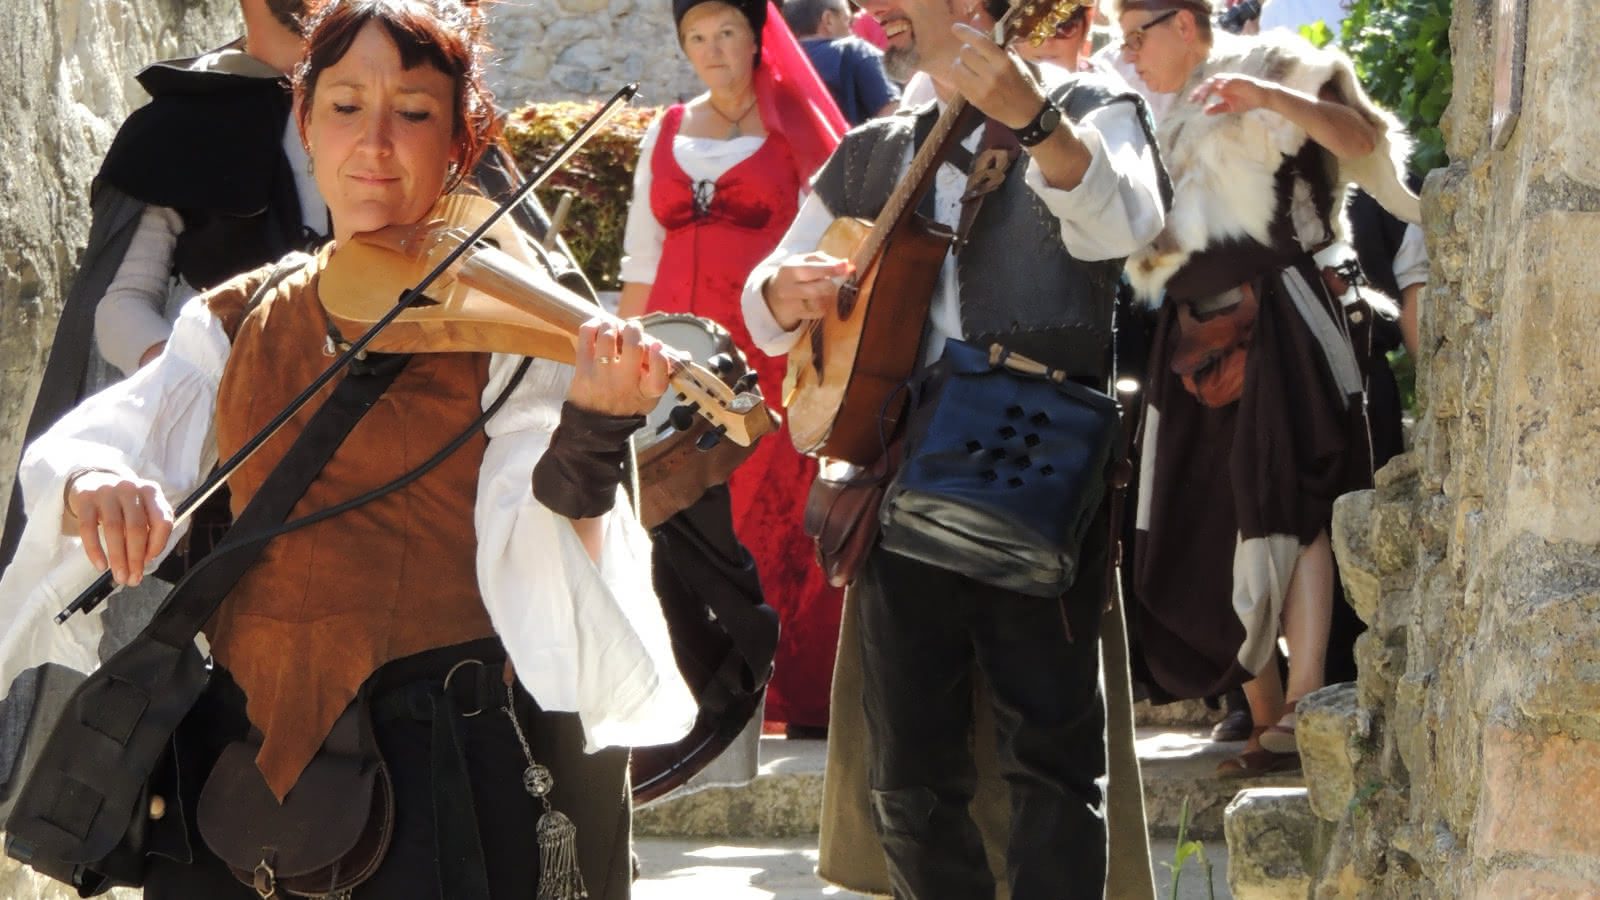 Fête Médiéval de Cruas